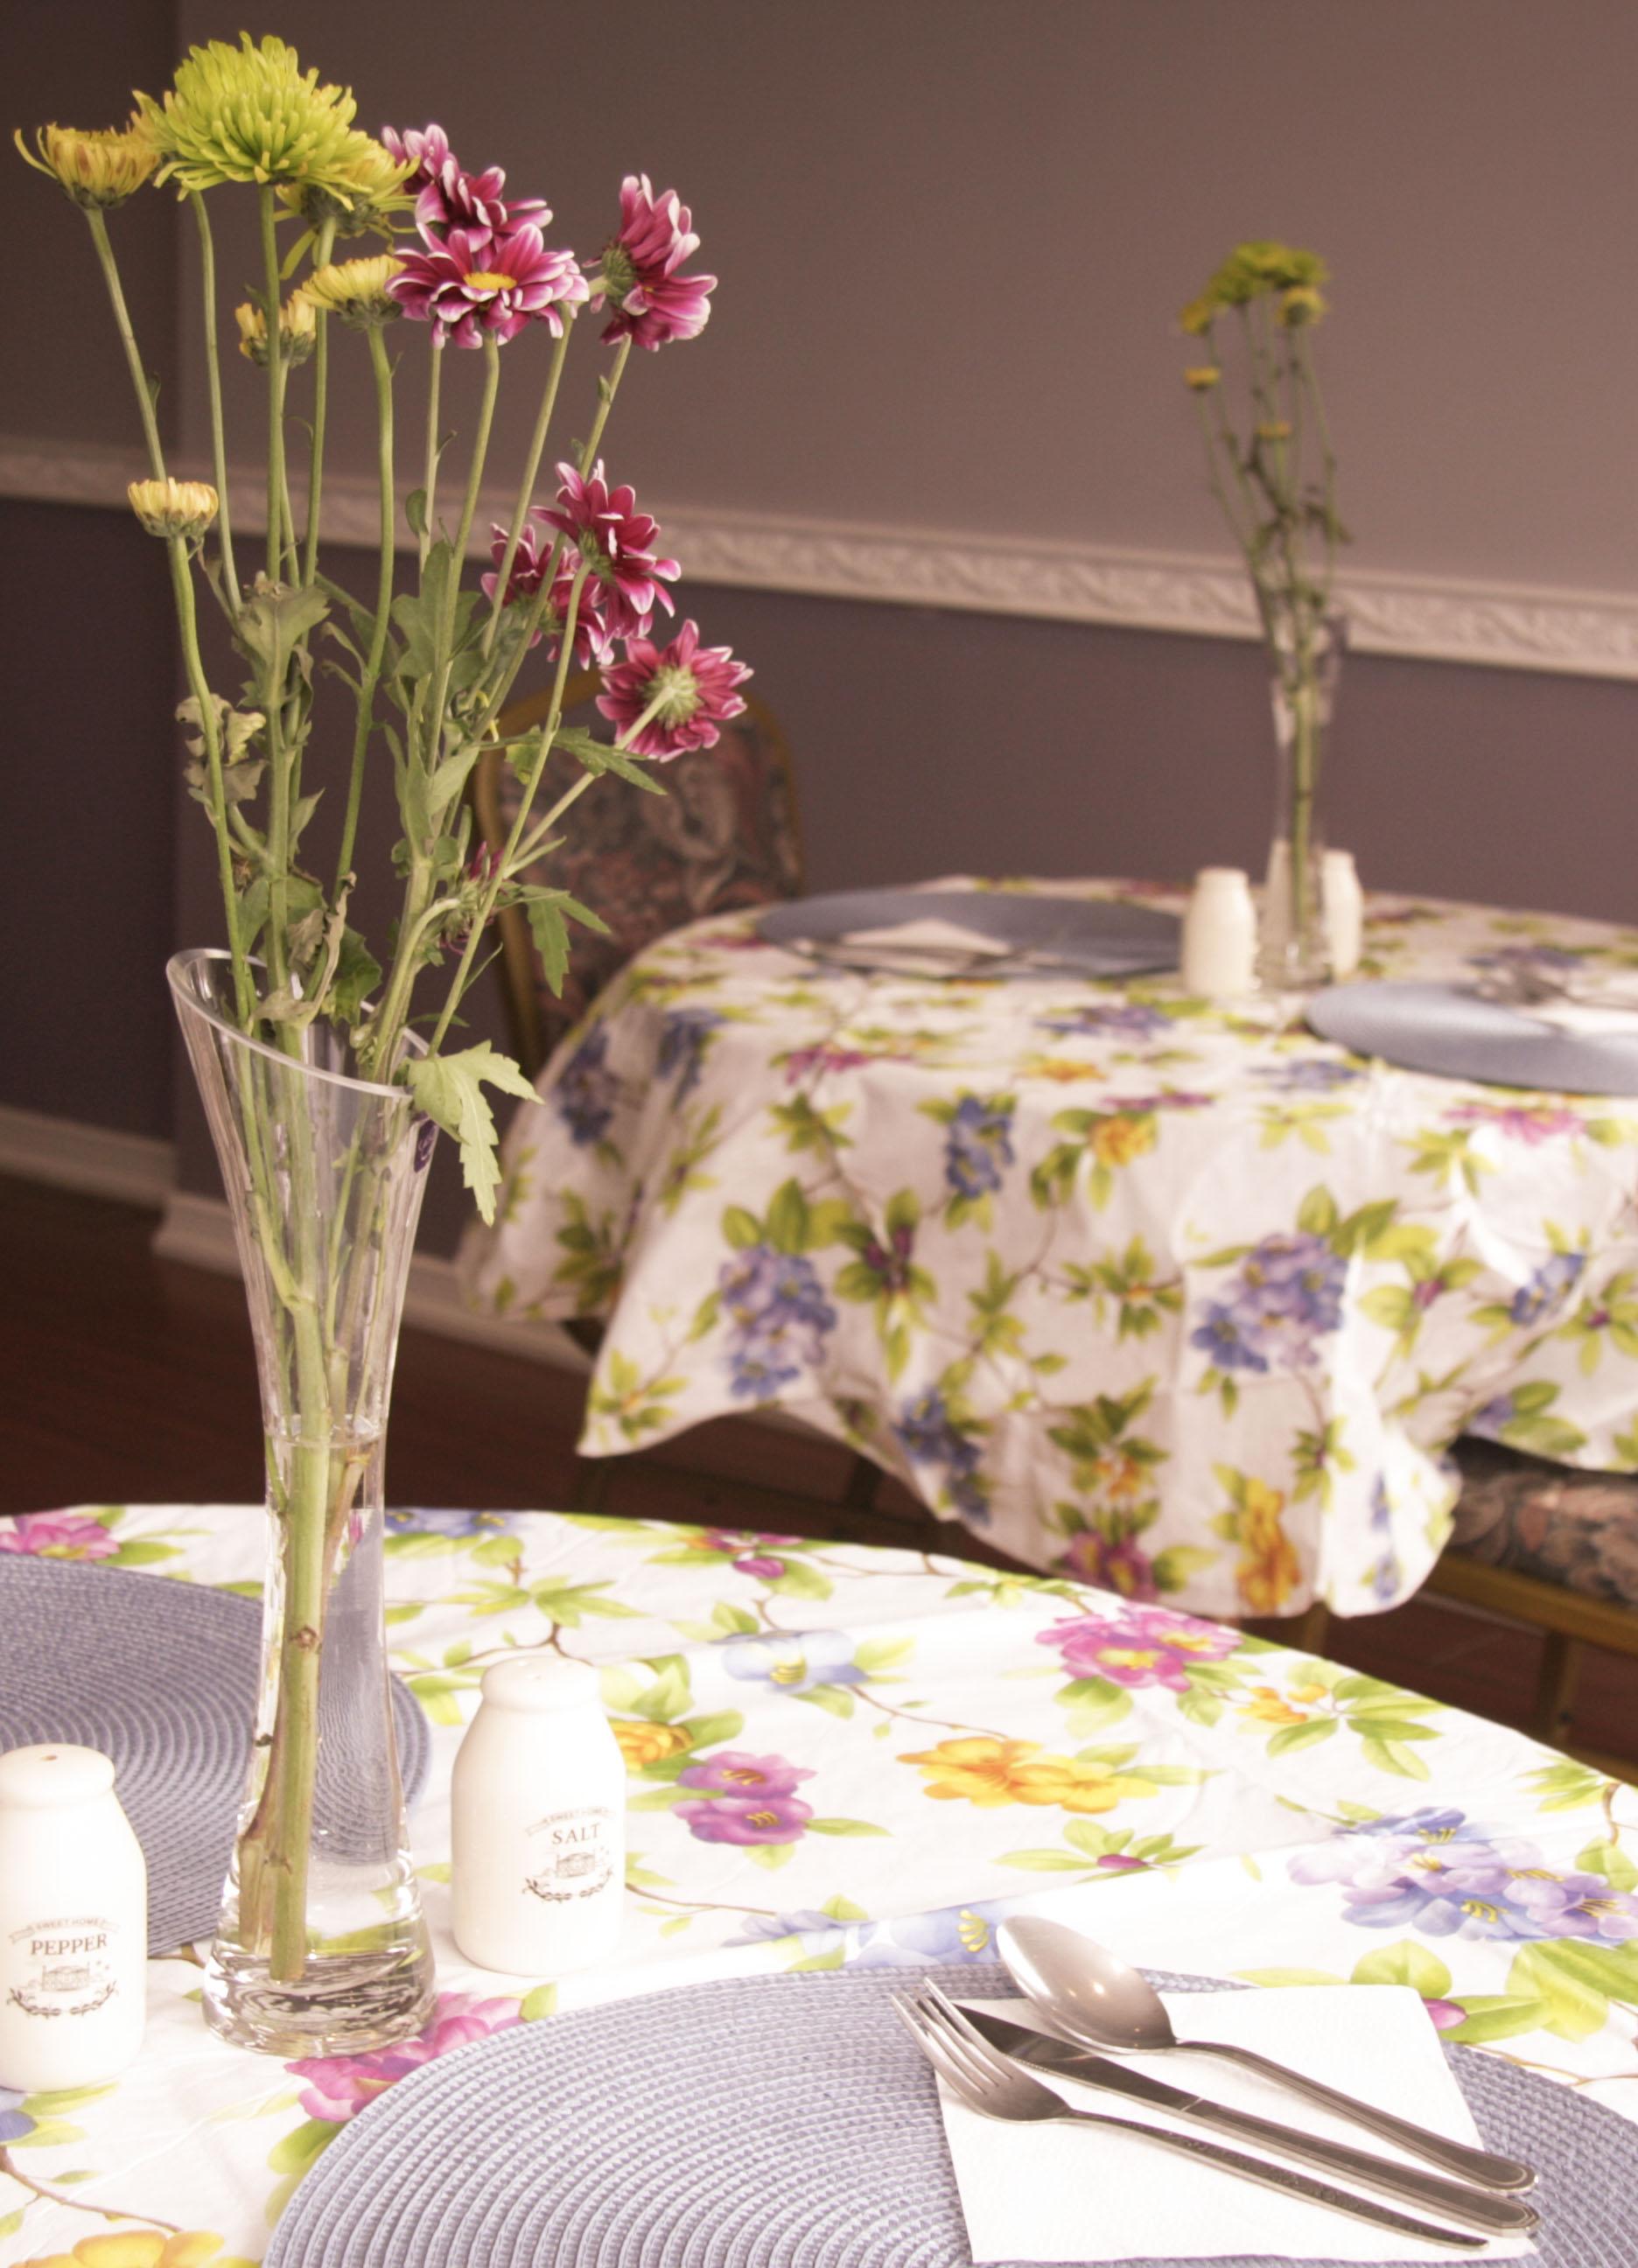 Rosedale dining room